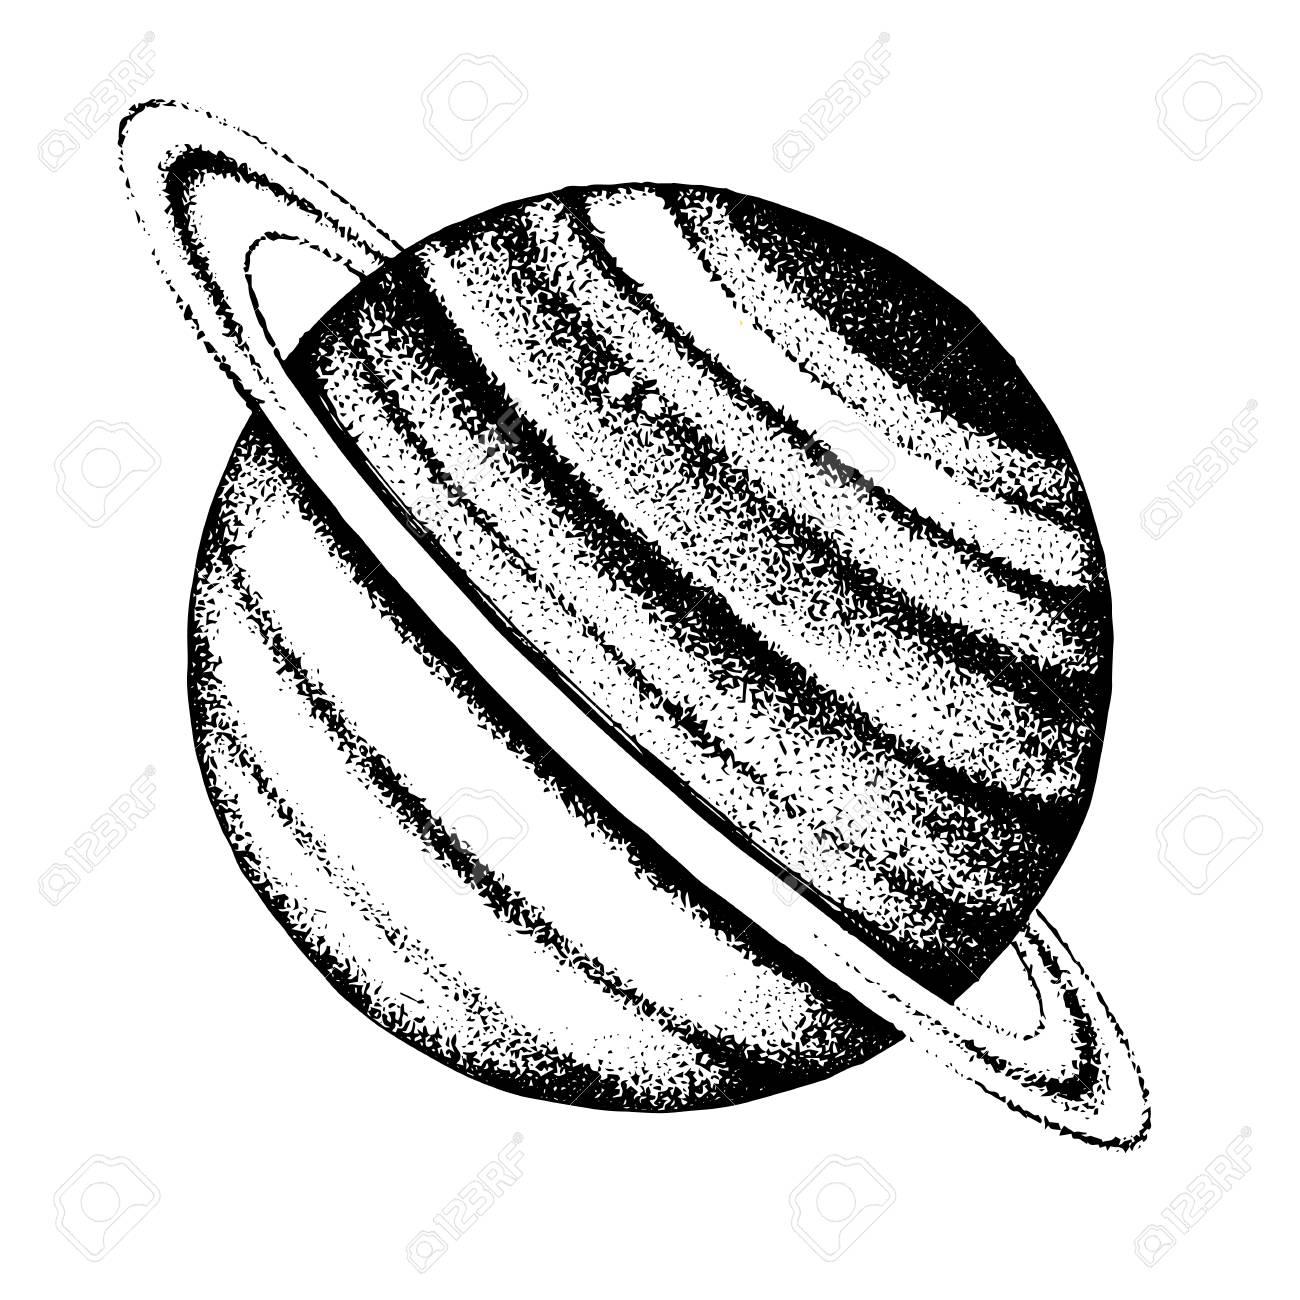 Hand drawn Saturn planet - 109807613